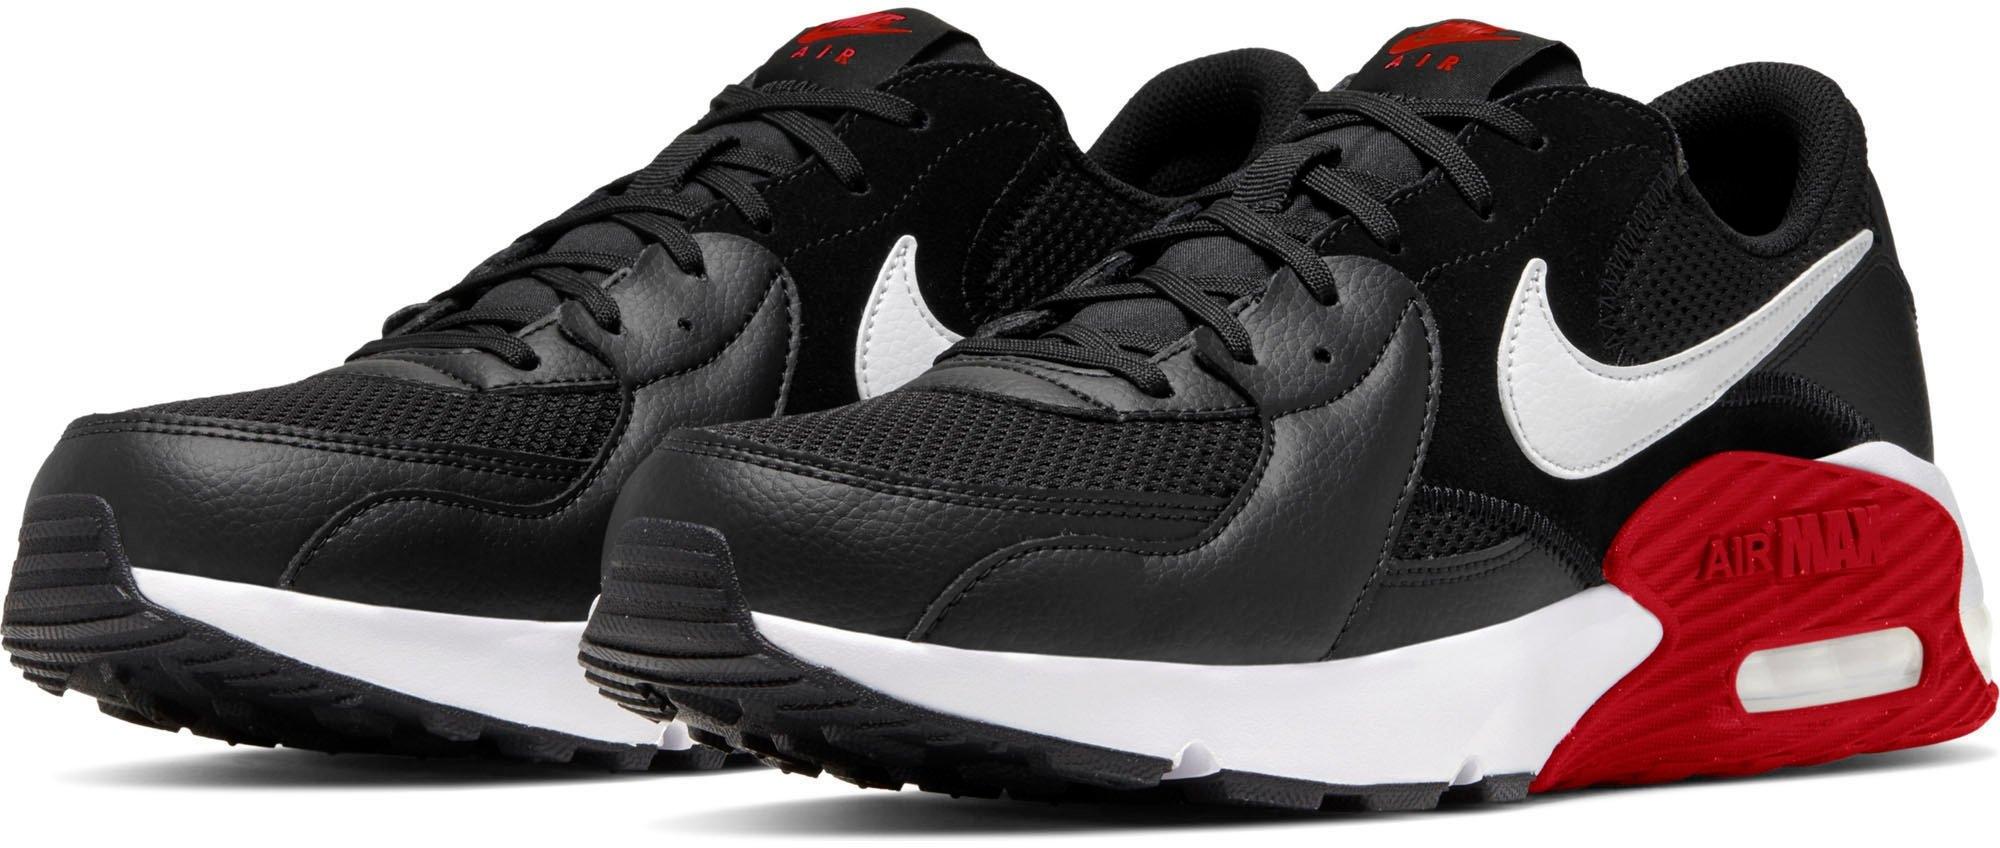 Nike Sportswear sneakers Air Max Excee bestellen: 30 dagen bedenktijd